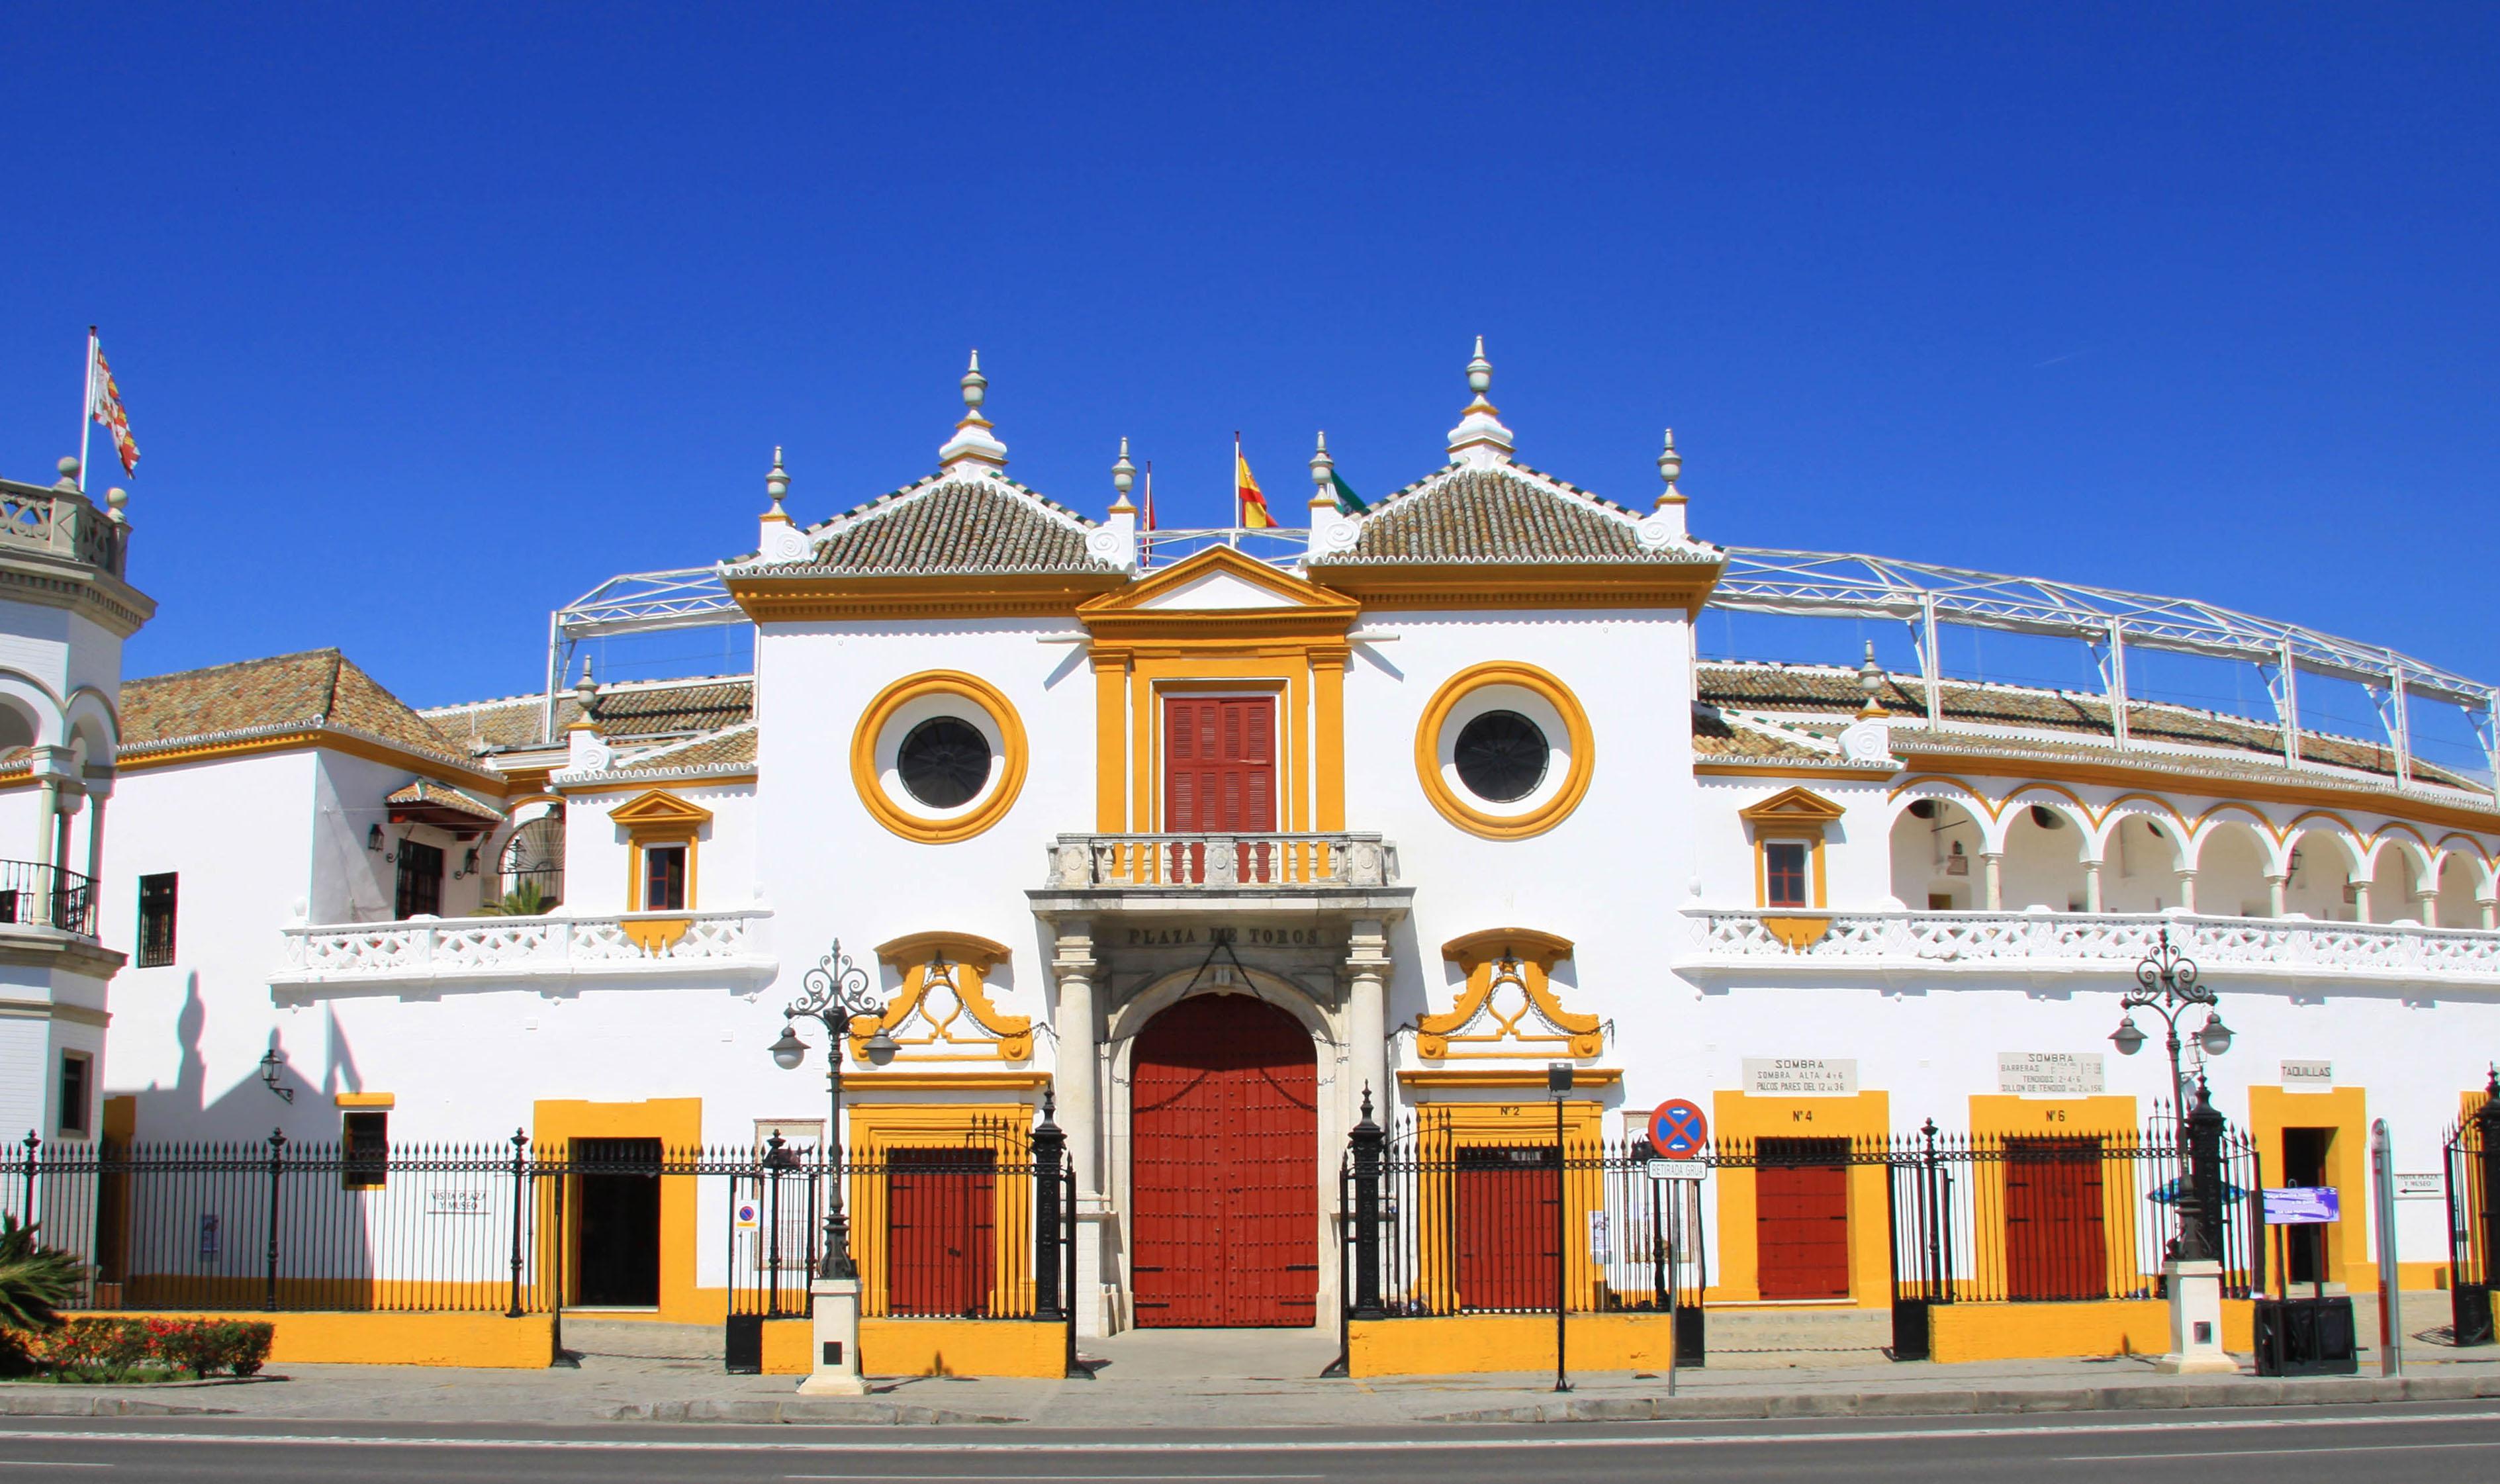 Plaza de Toros de la Maestranza